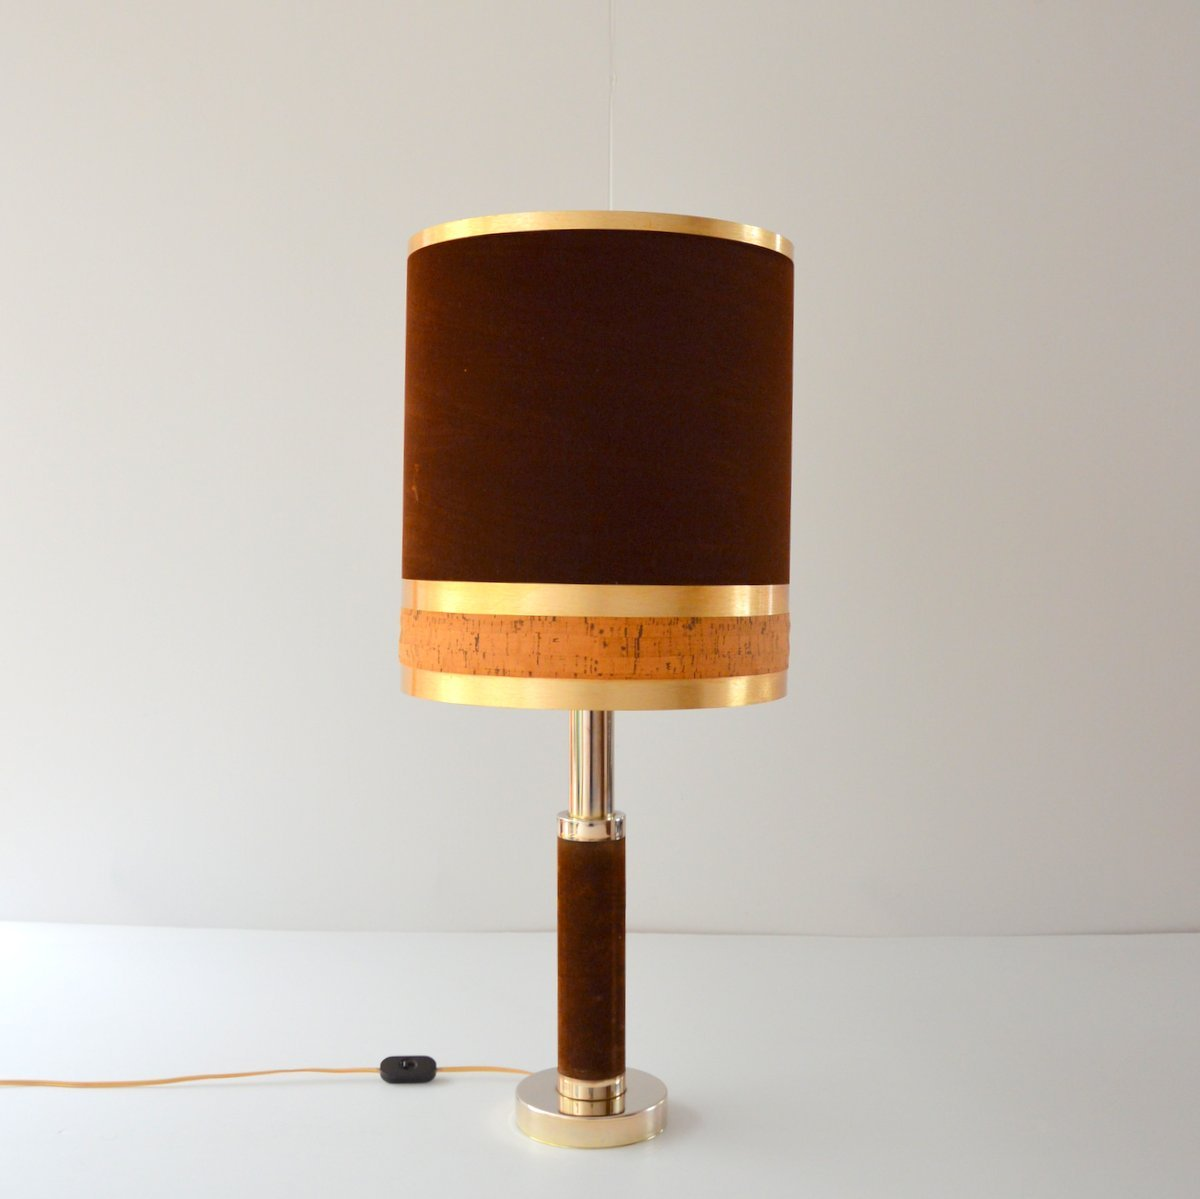 Tischlampe aus Samt, Kork & Messing, 1970er